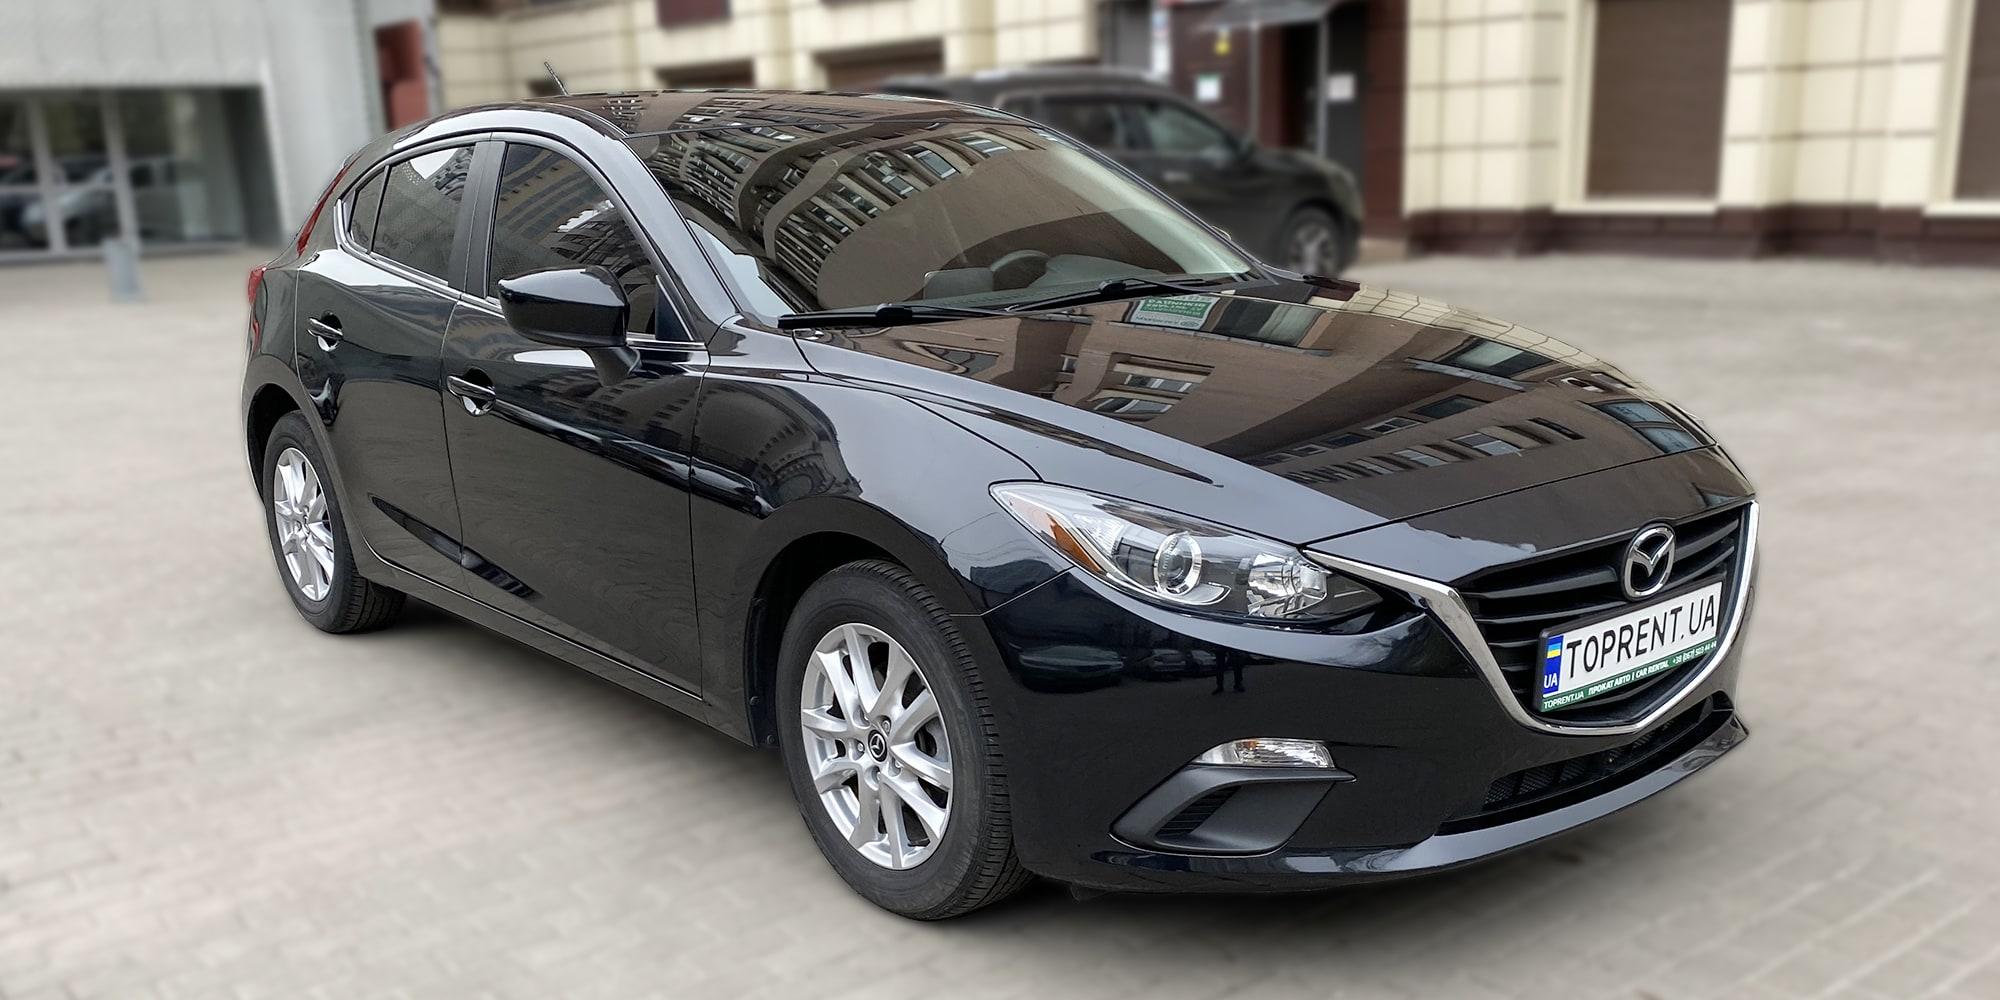 Mazda 3 hatchback - TopRent.UA - 1